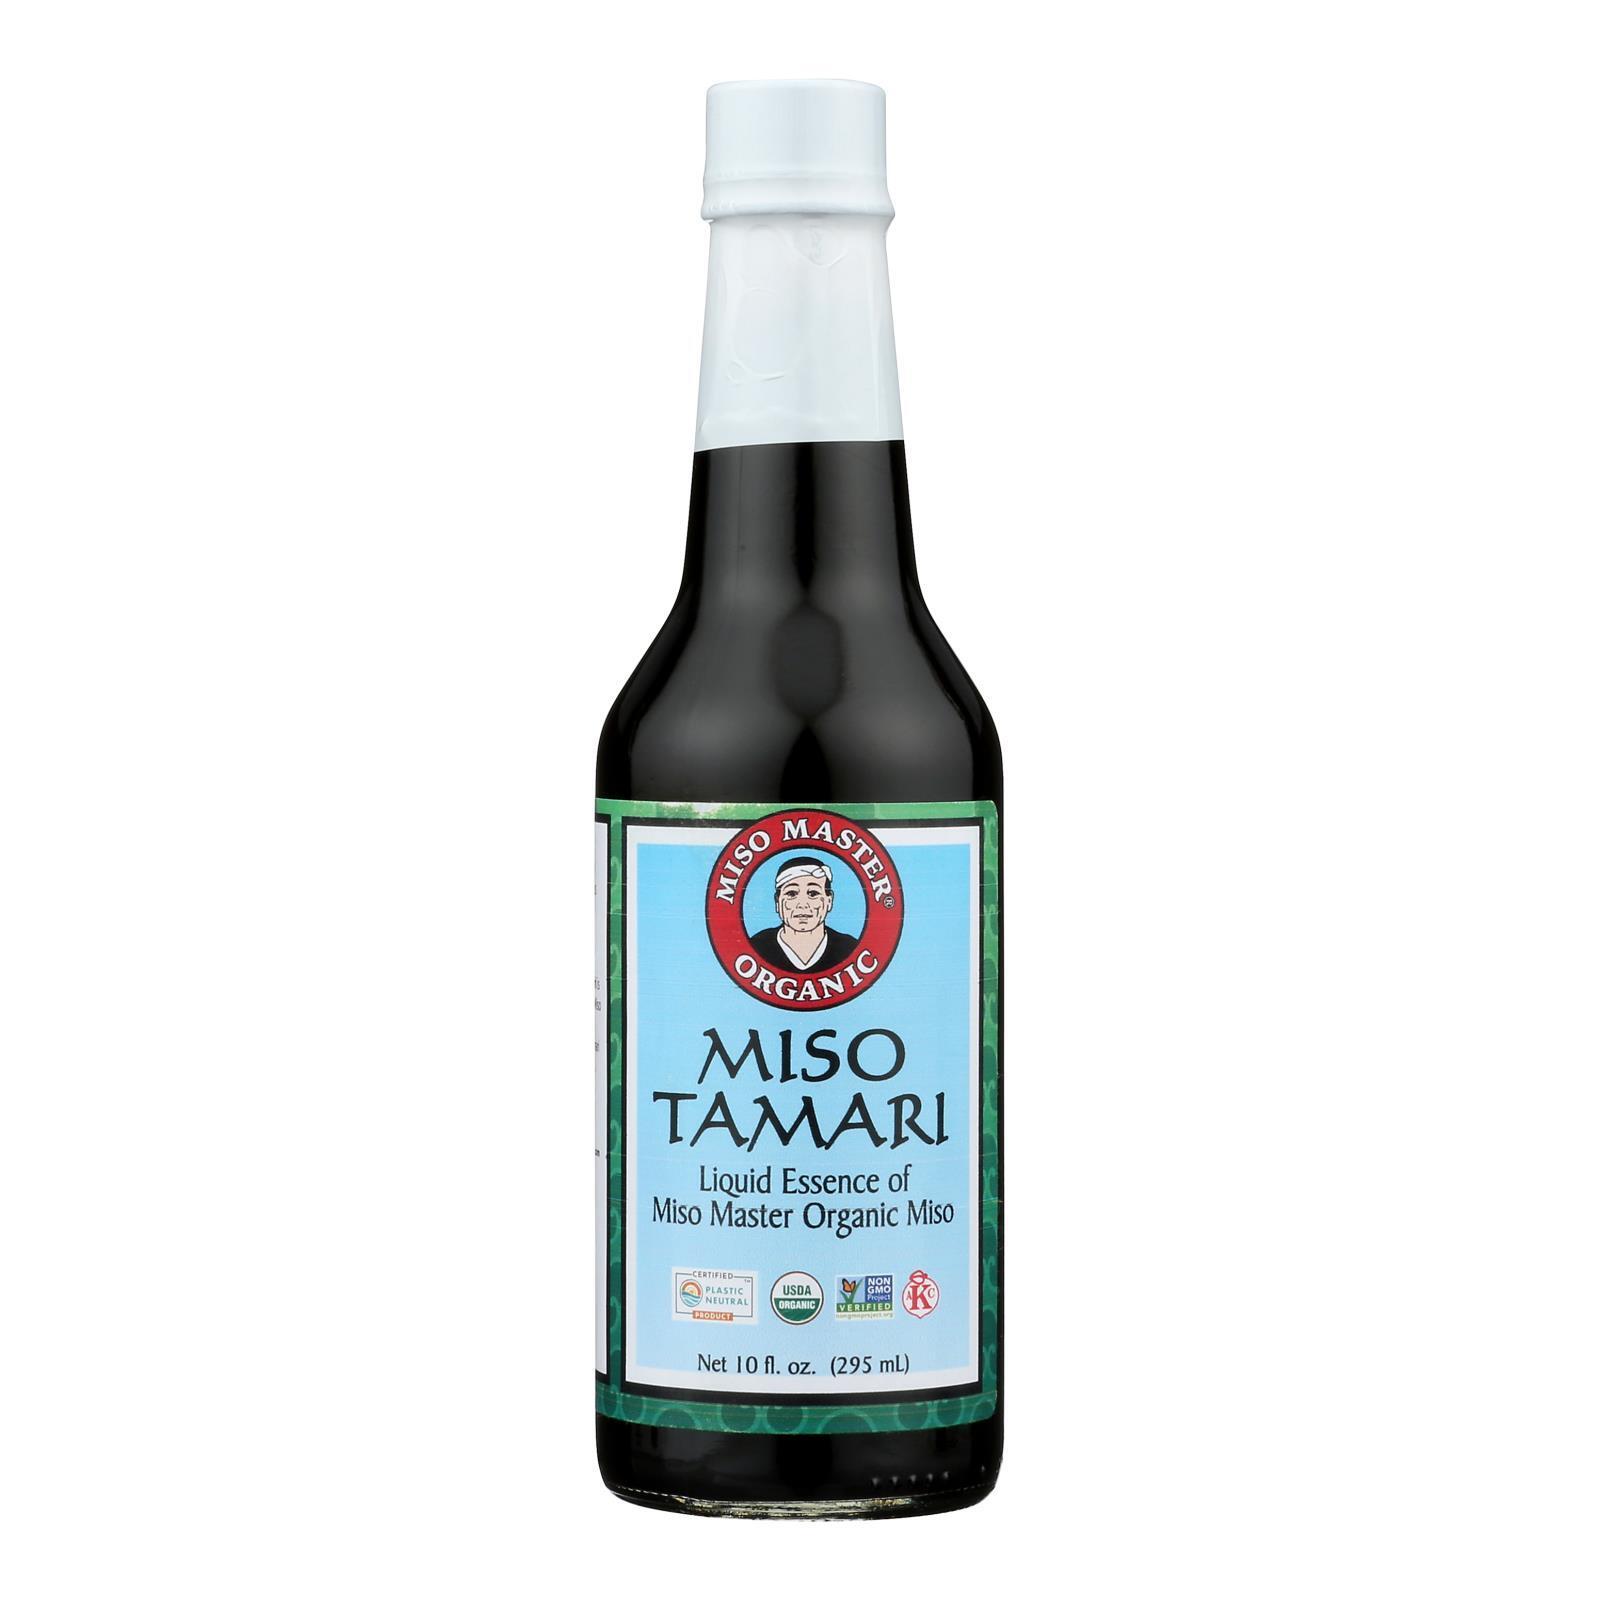 Miso Master Miso Tamari - Organic - 10 oz - case of 12